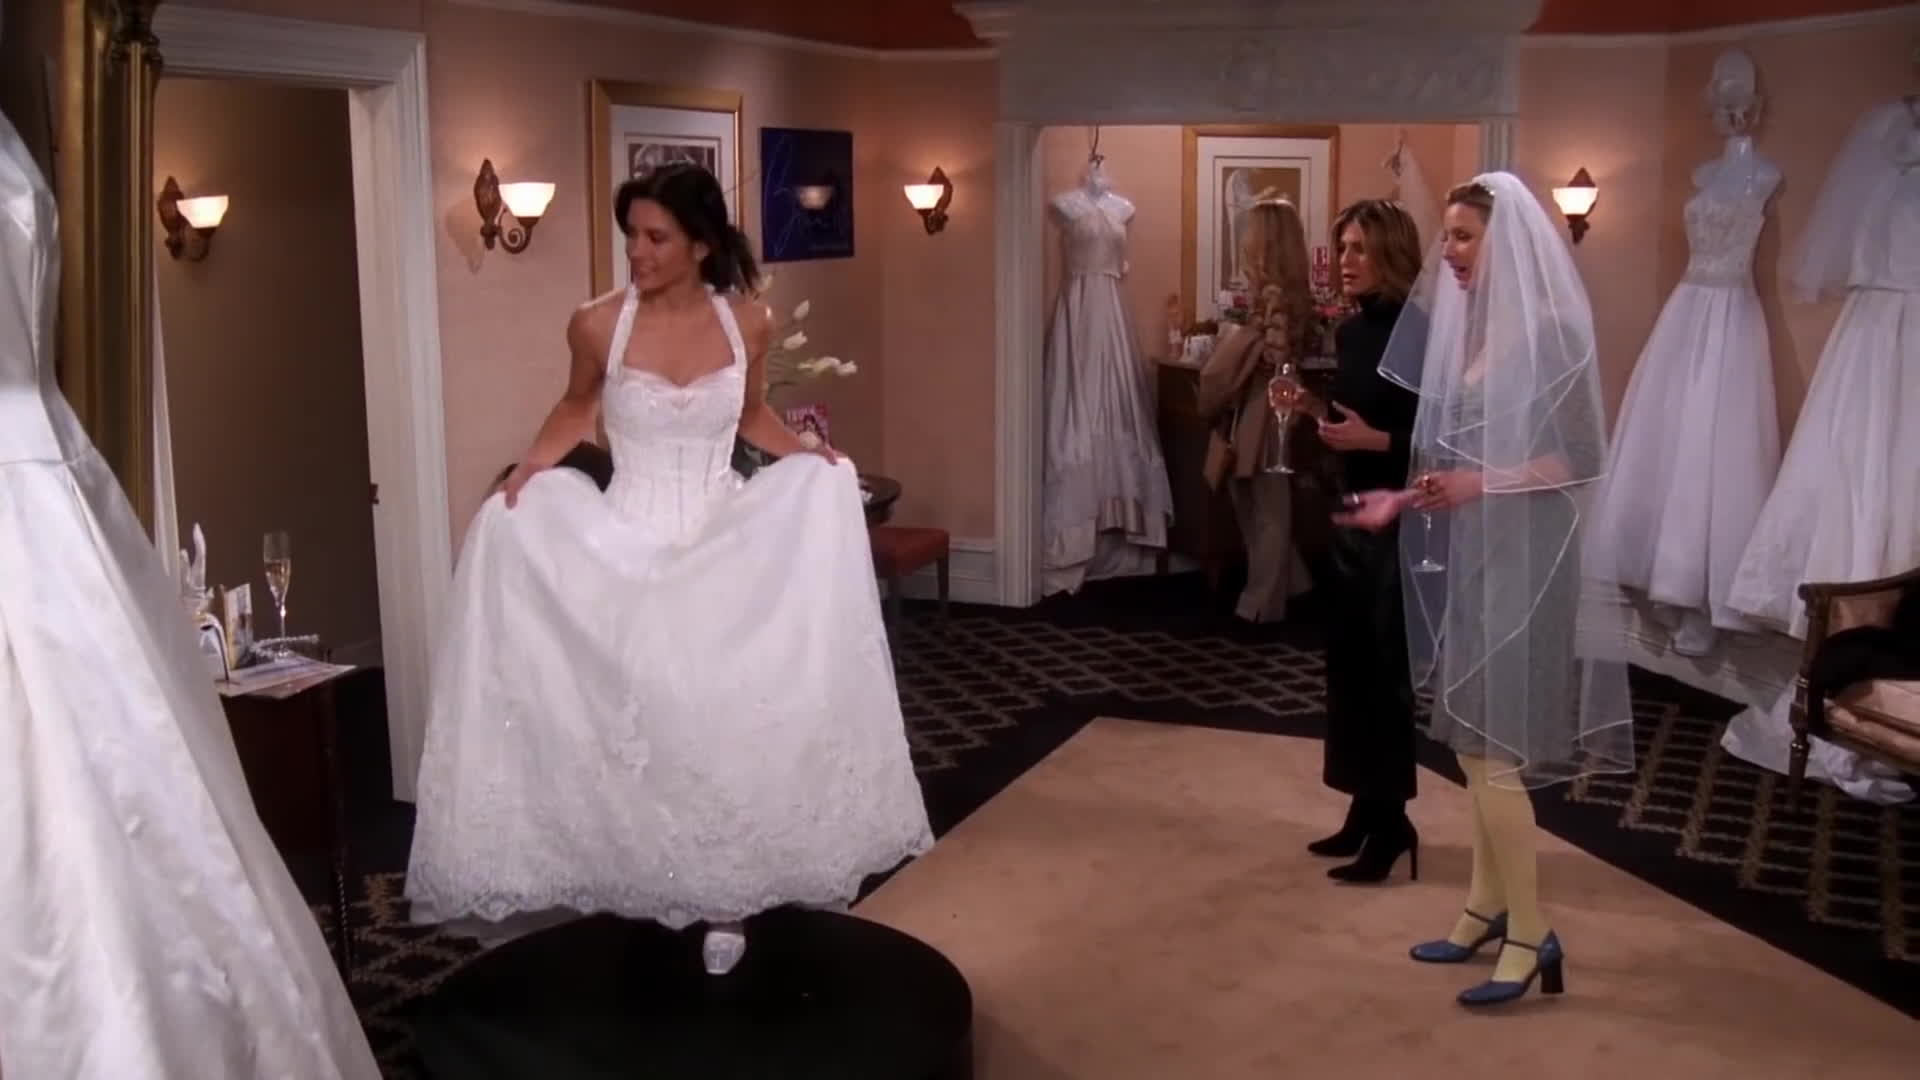 Friends The Cheap Wedding Dress Gif Find Make Share Gfycat Gifs